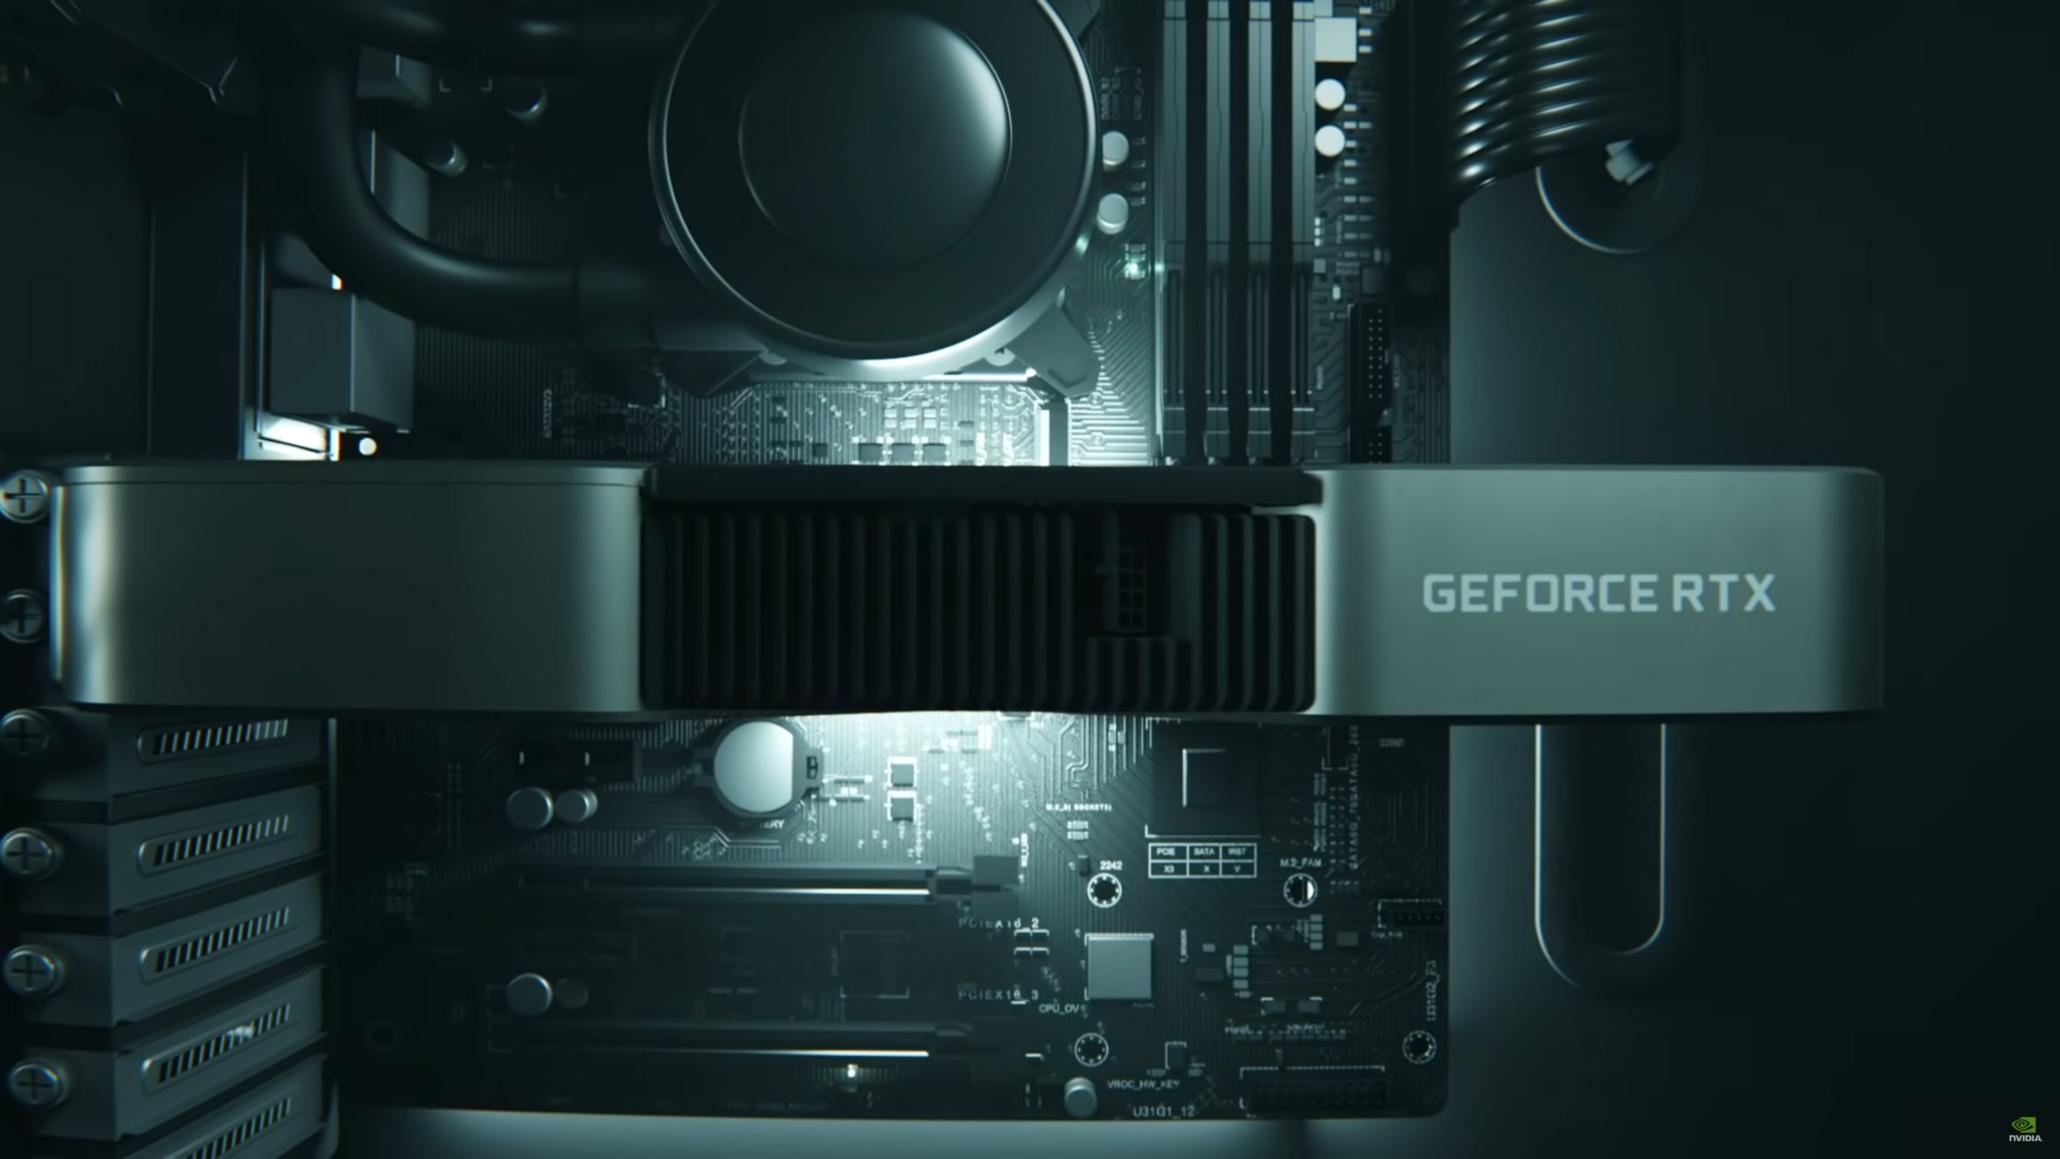 EVGA & ZOTAC Custom GeForce RTX 3060 Ti Graphics Cards Bocor - FTW, XC3, Twin Edge